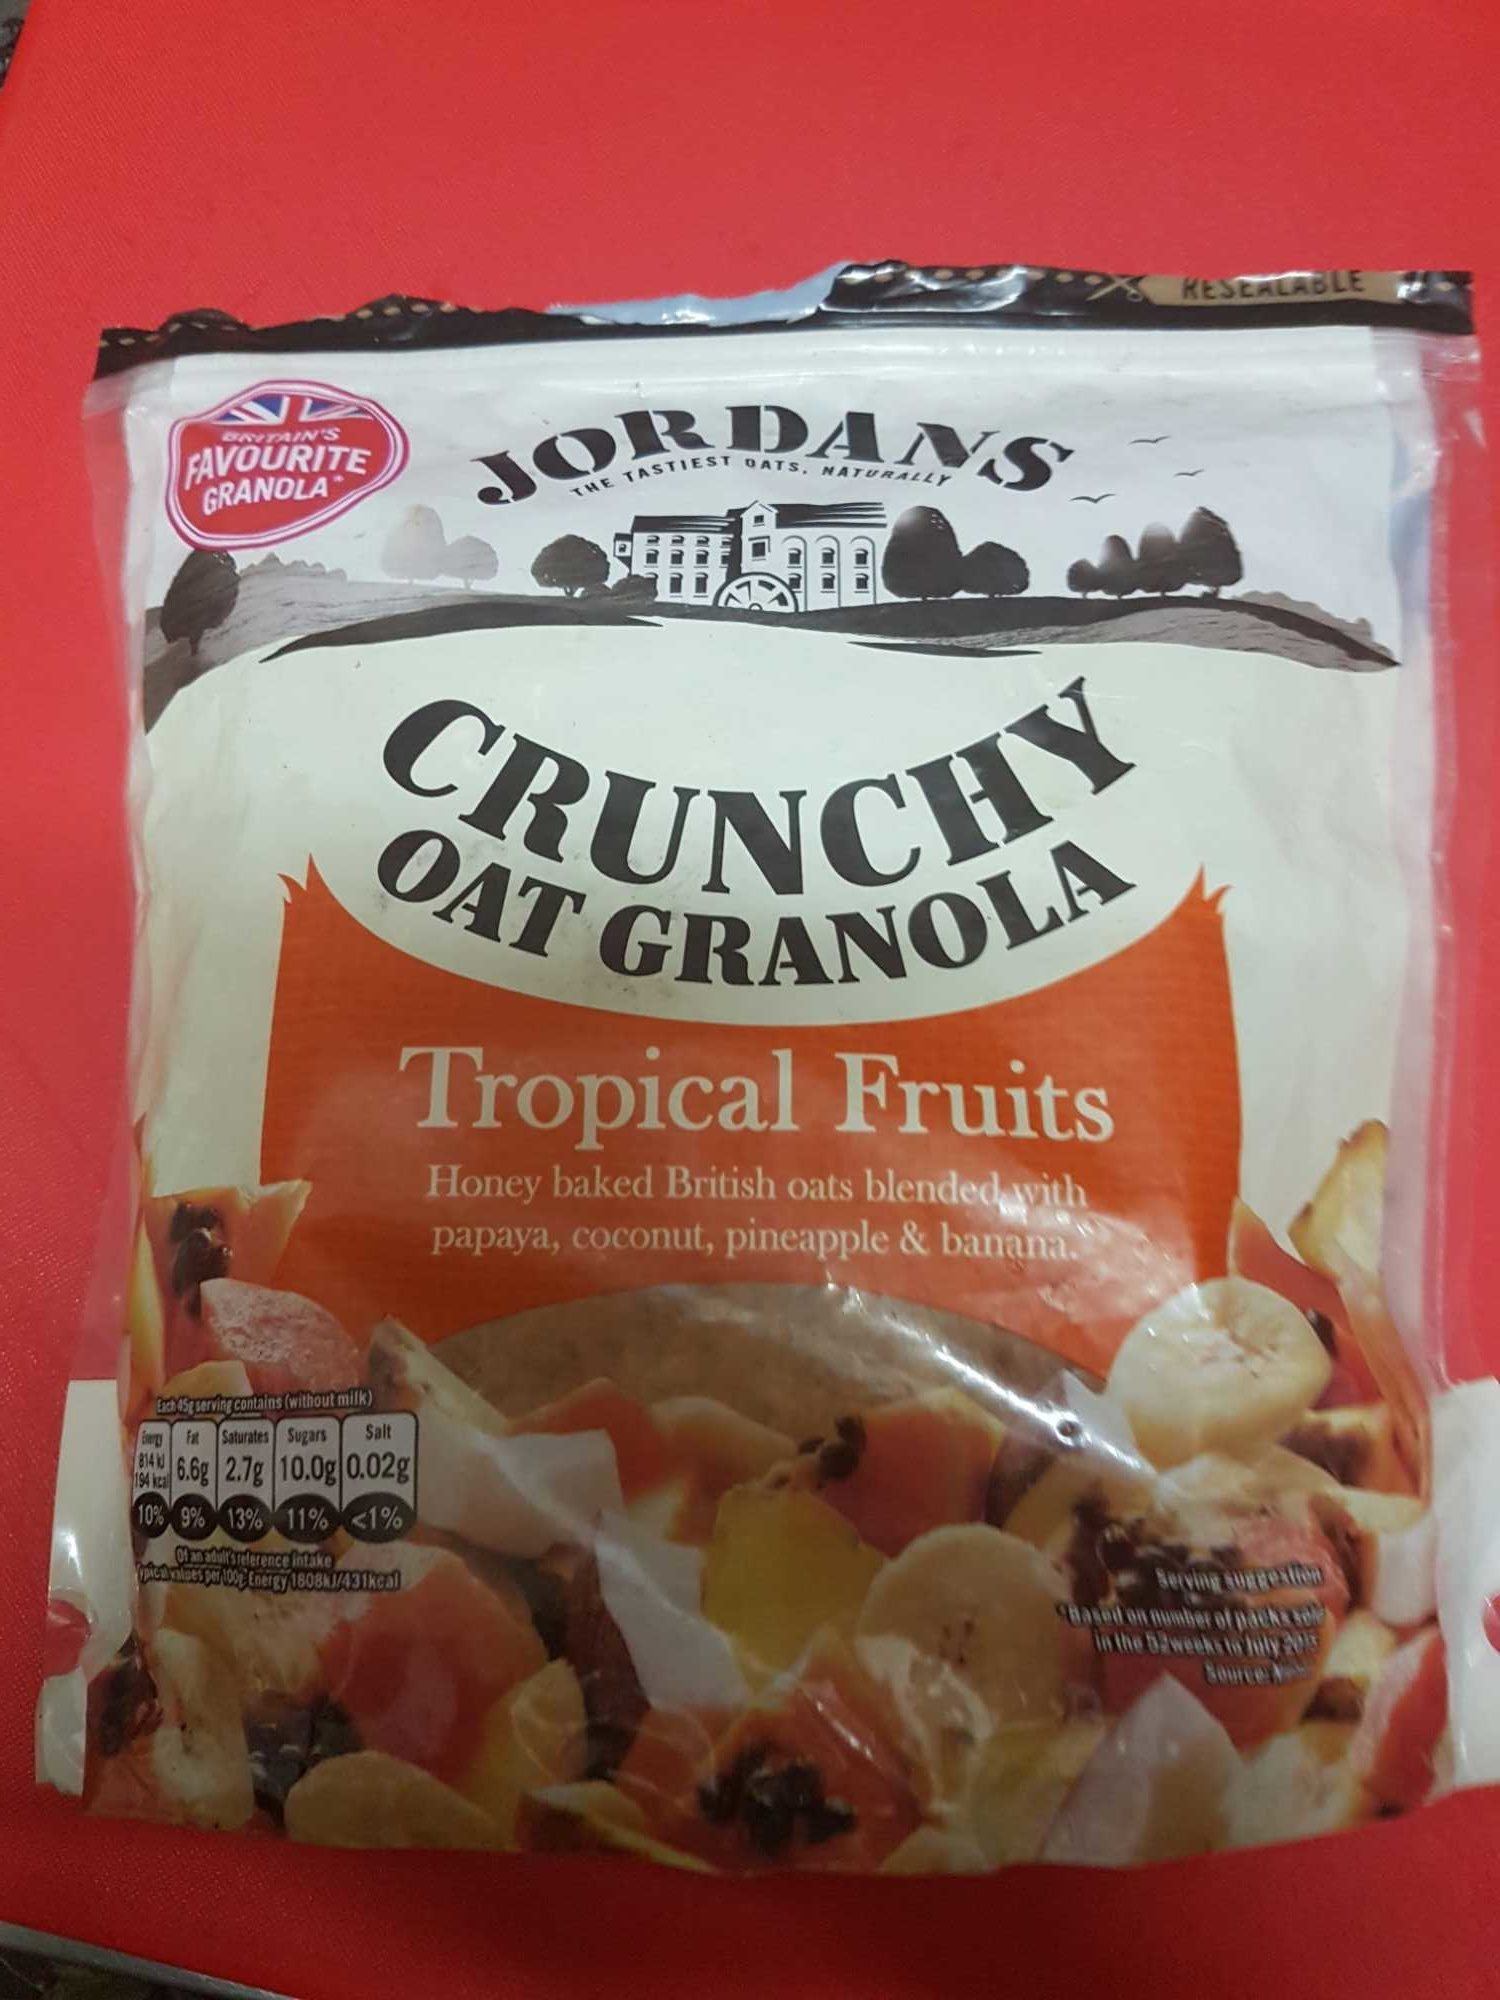 Crunchy Oat Granola Tropical Fruits-Jordans - Product - en